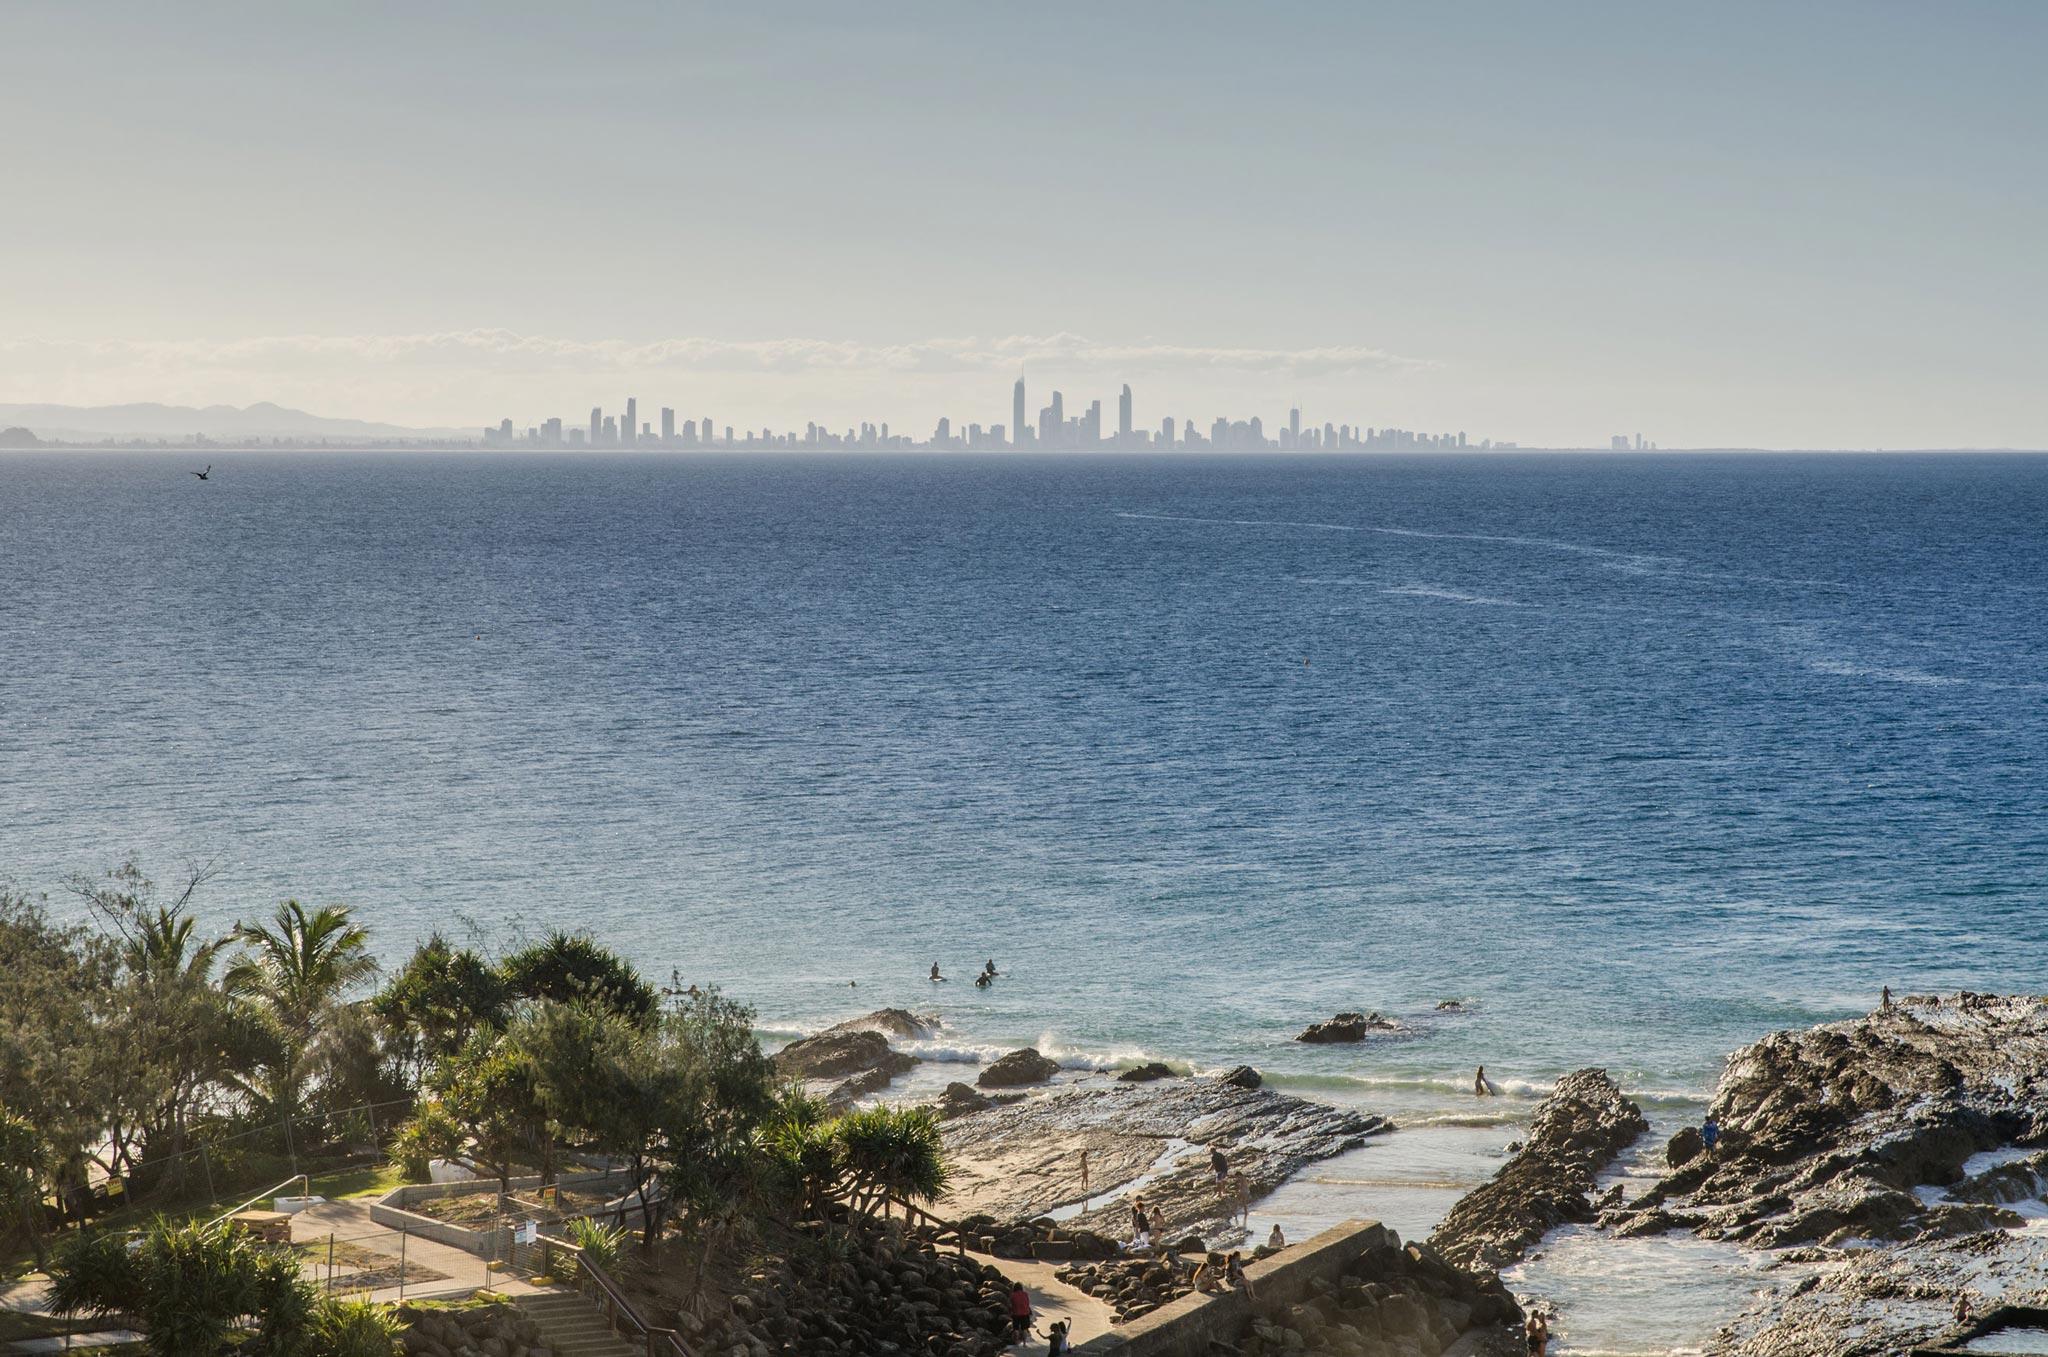 Paesaggi-Australia - DSC 8491 - Surfer-Paradise-Australia-from-Coolangatta - Surfer-Paradise-Australia-from-Coolangatta